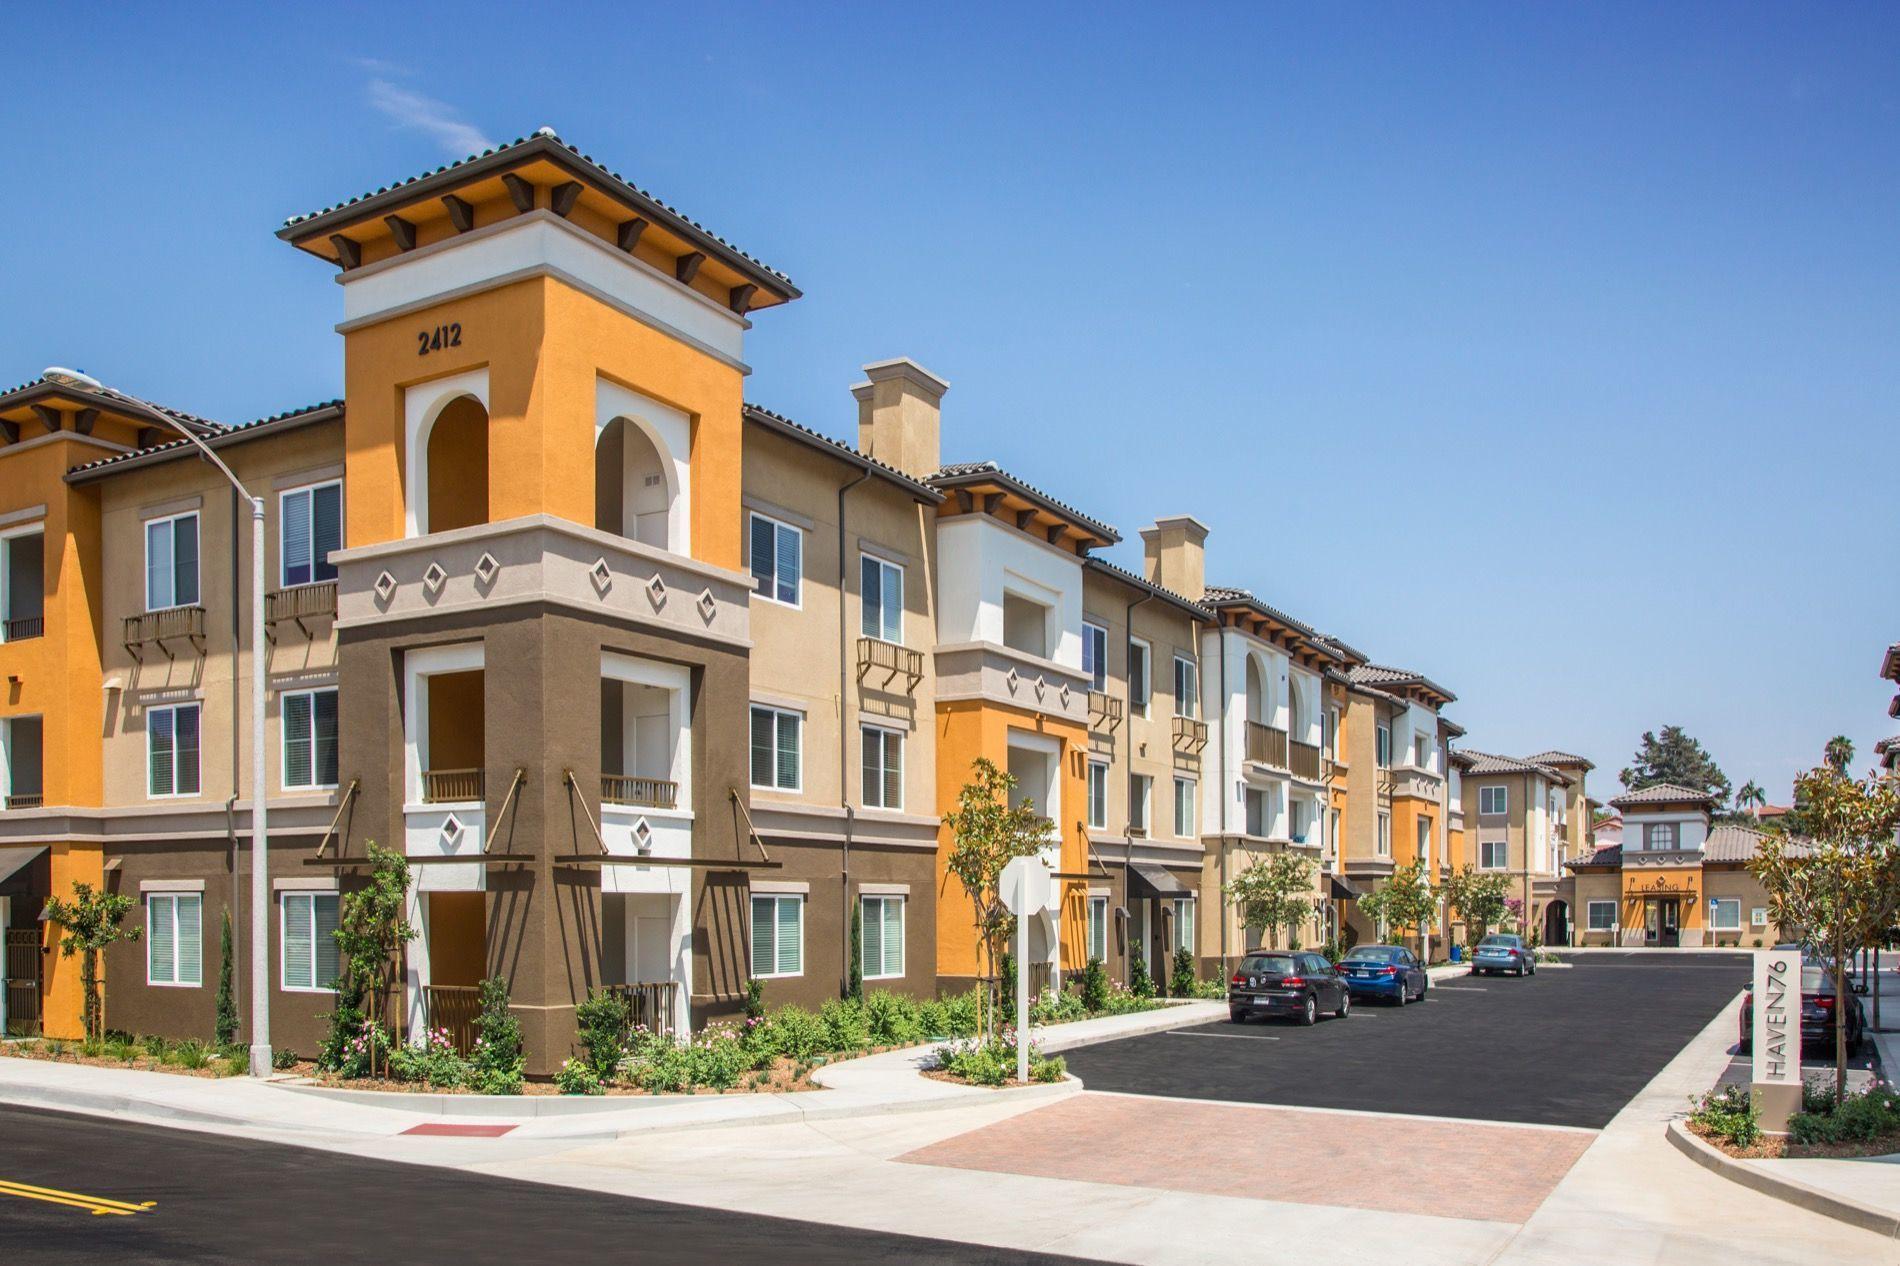 csu san marcos cal state san marcos apartments near campus uloop